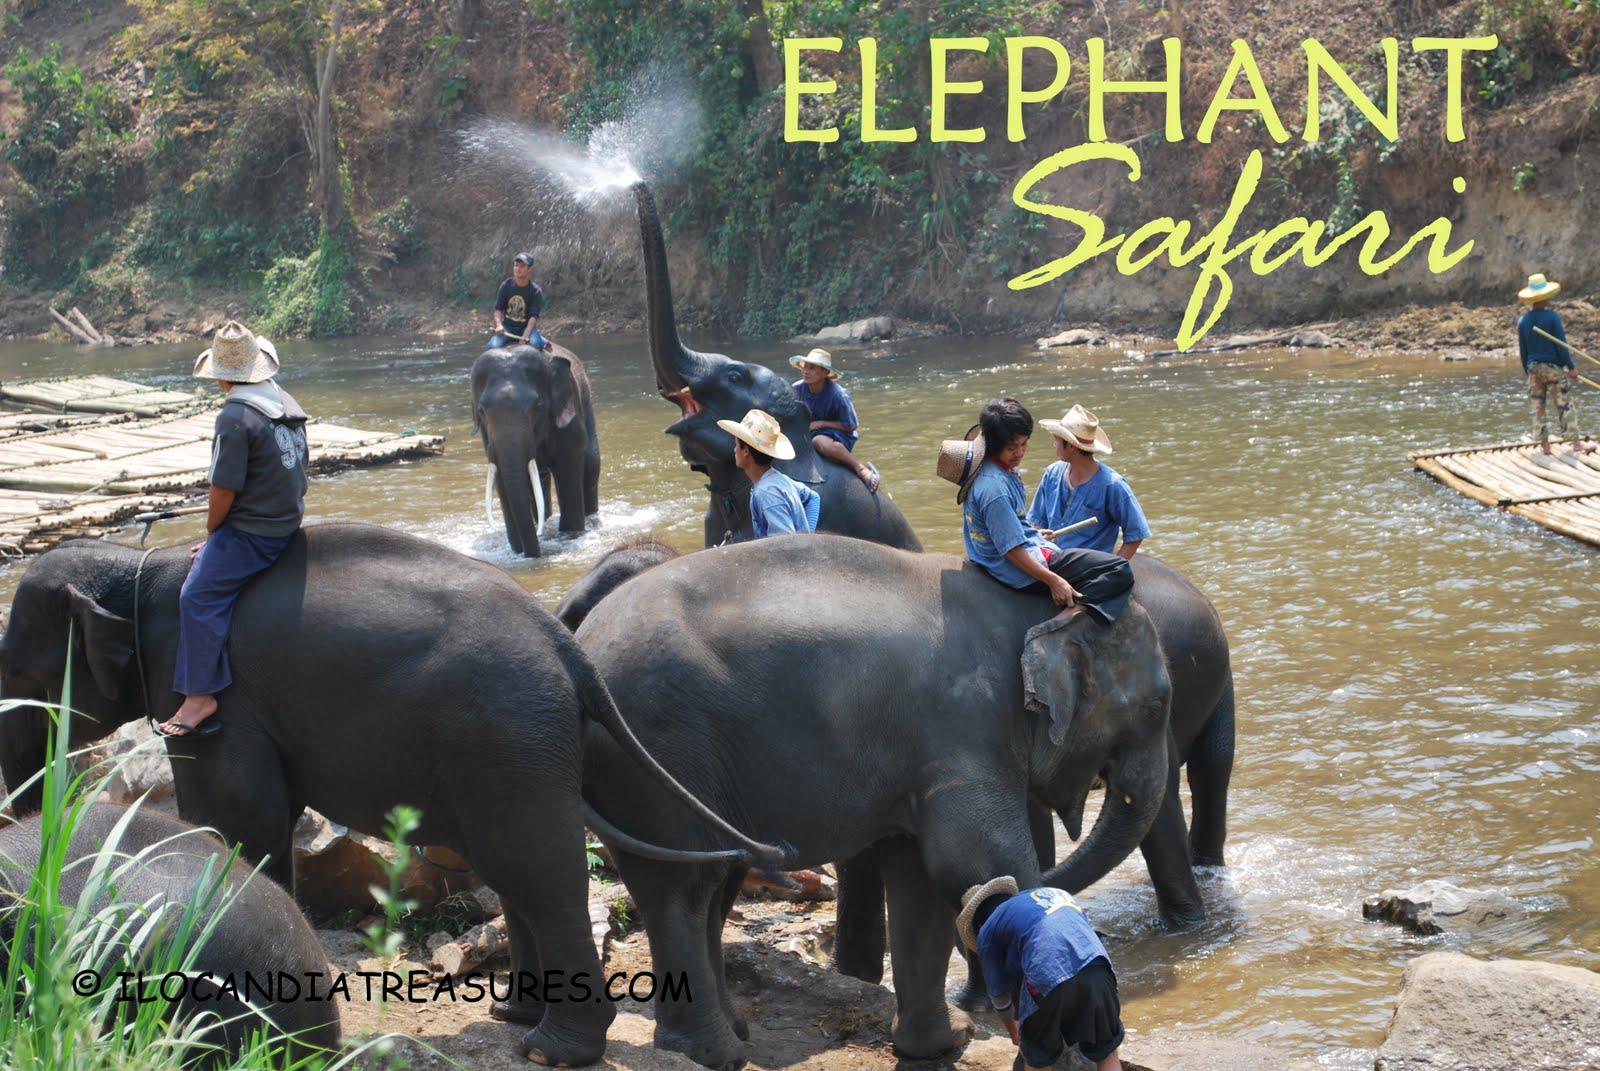 treasures of ilocandia and the world an elephant safari in thailand